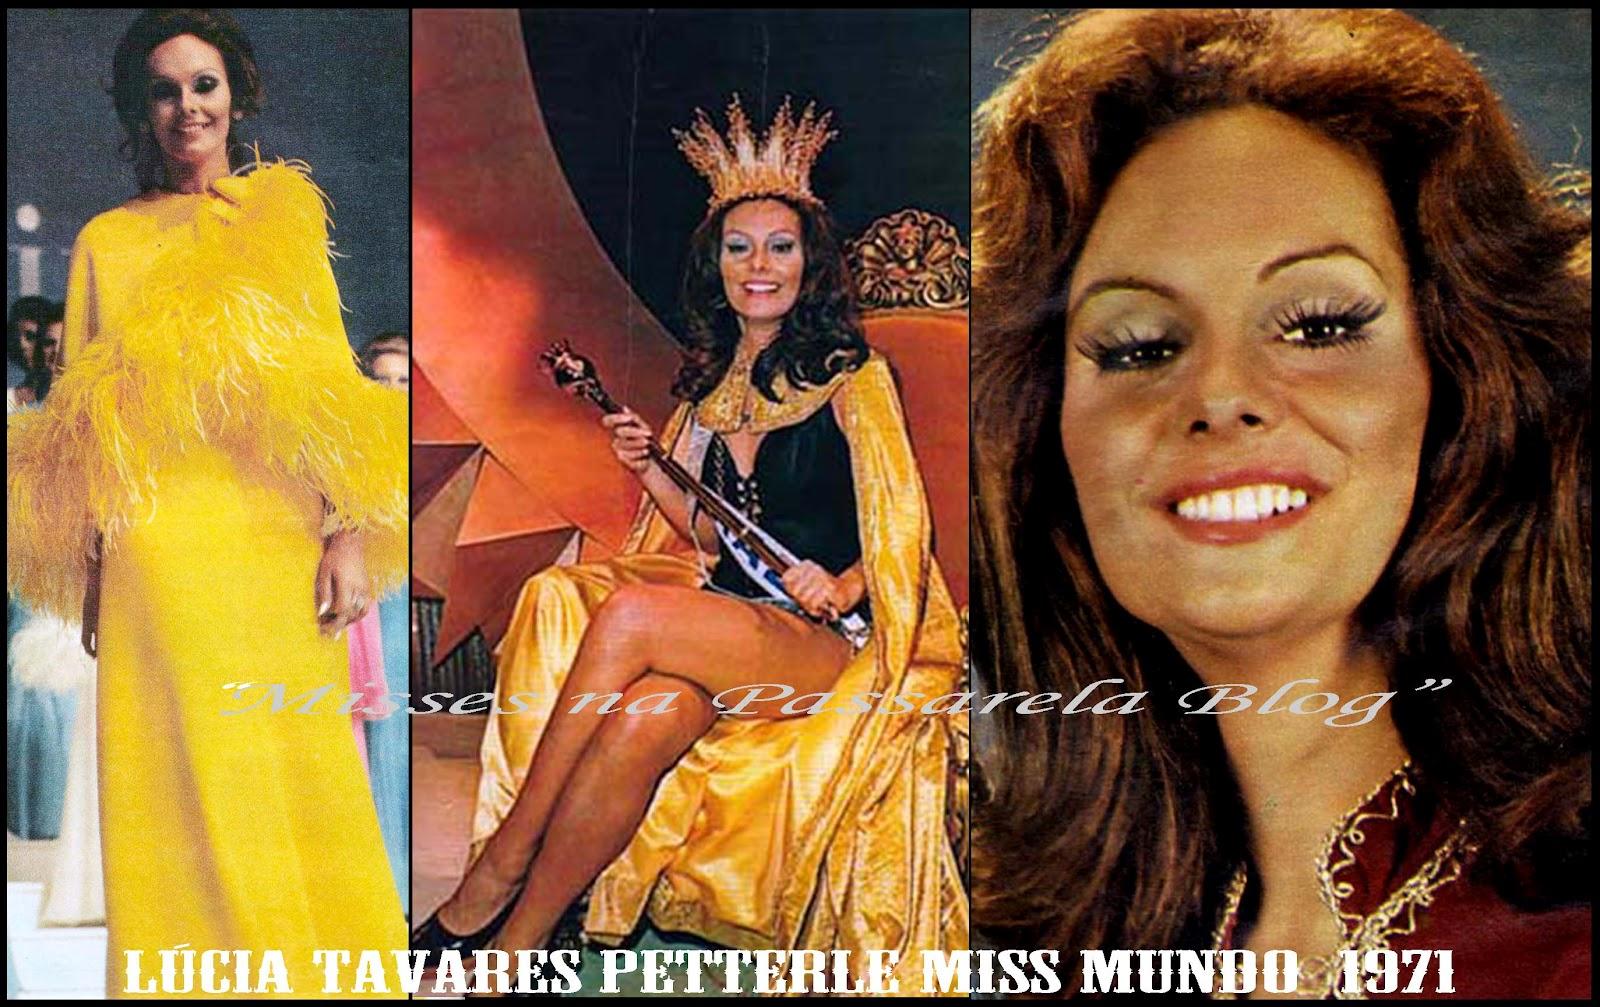 "˜*•. ˜""*°•.˜""*°••°* Lucia Petterle, Miss World 1971. ˜*•. ˜""*°•.˜""*°••°* L%C3%BAcia+Petterle+71"